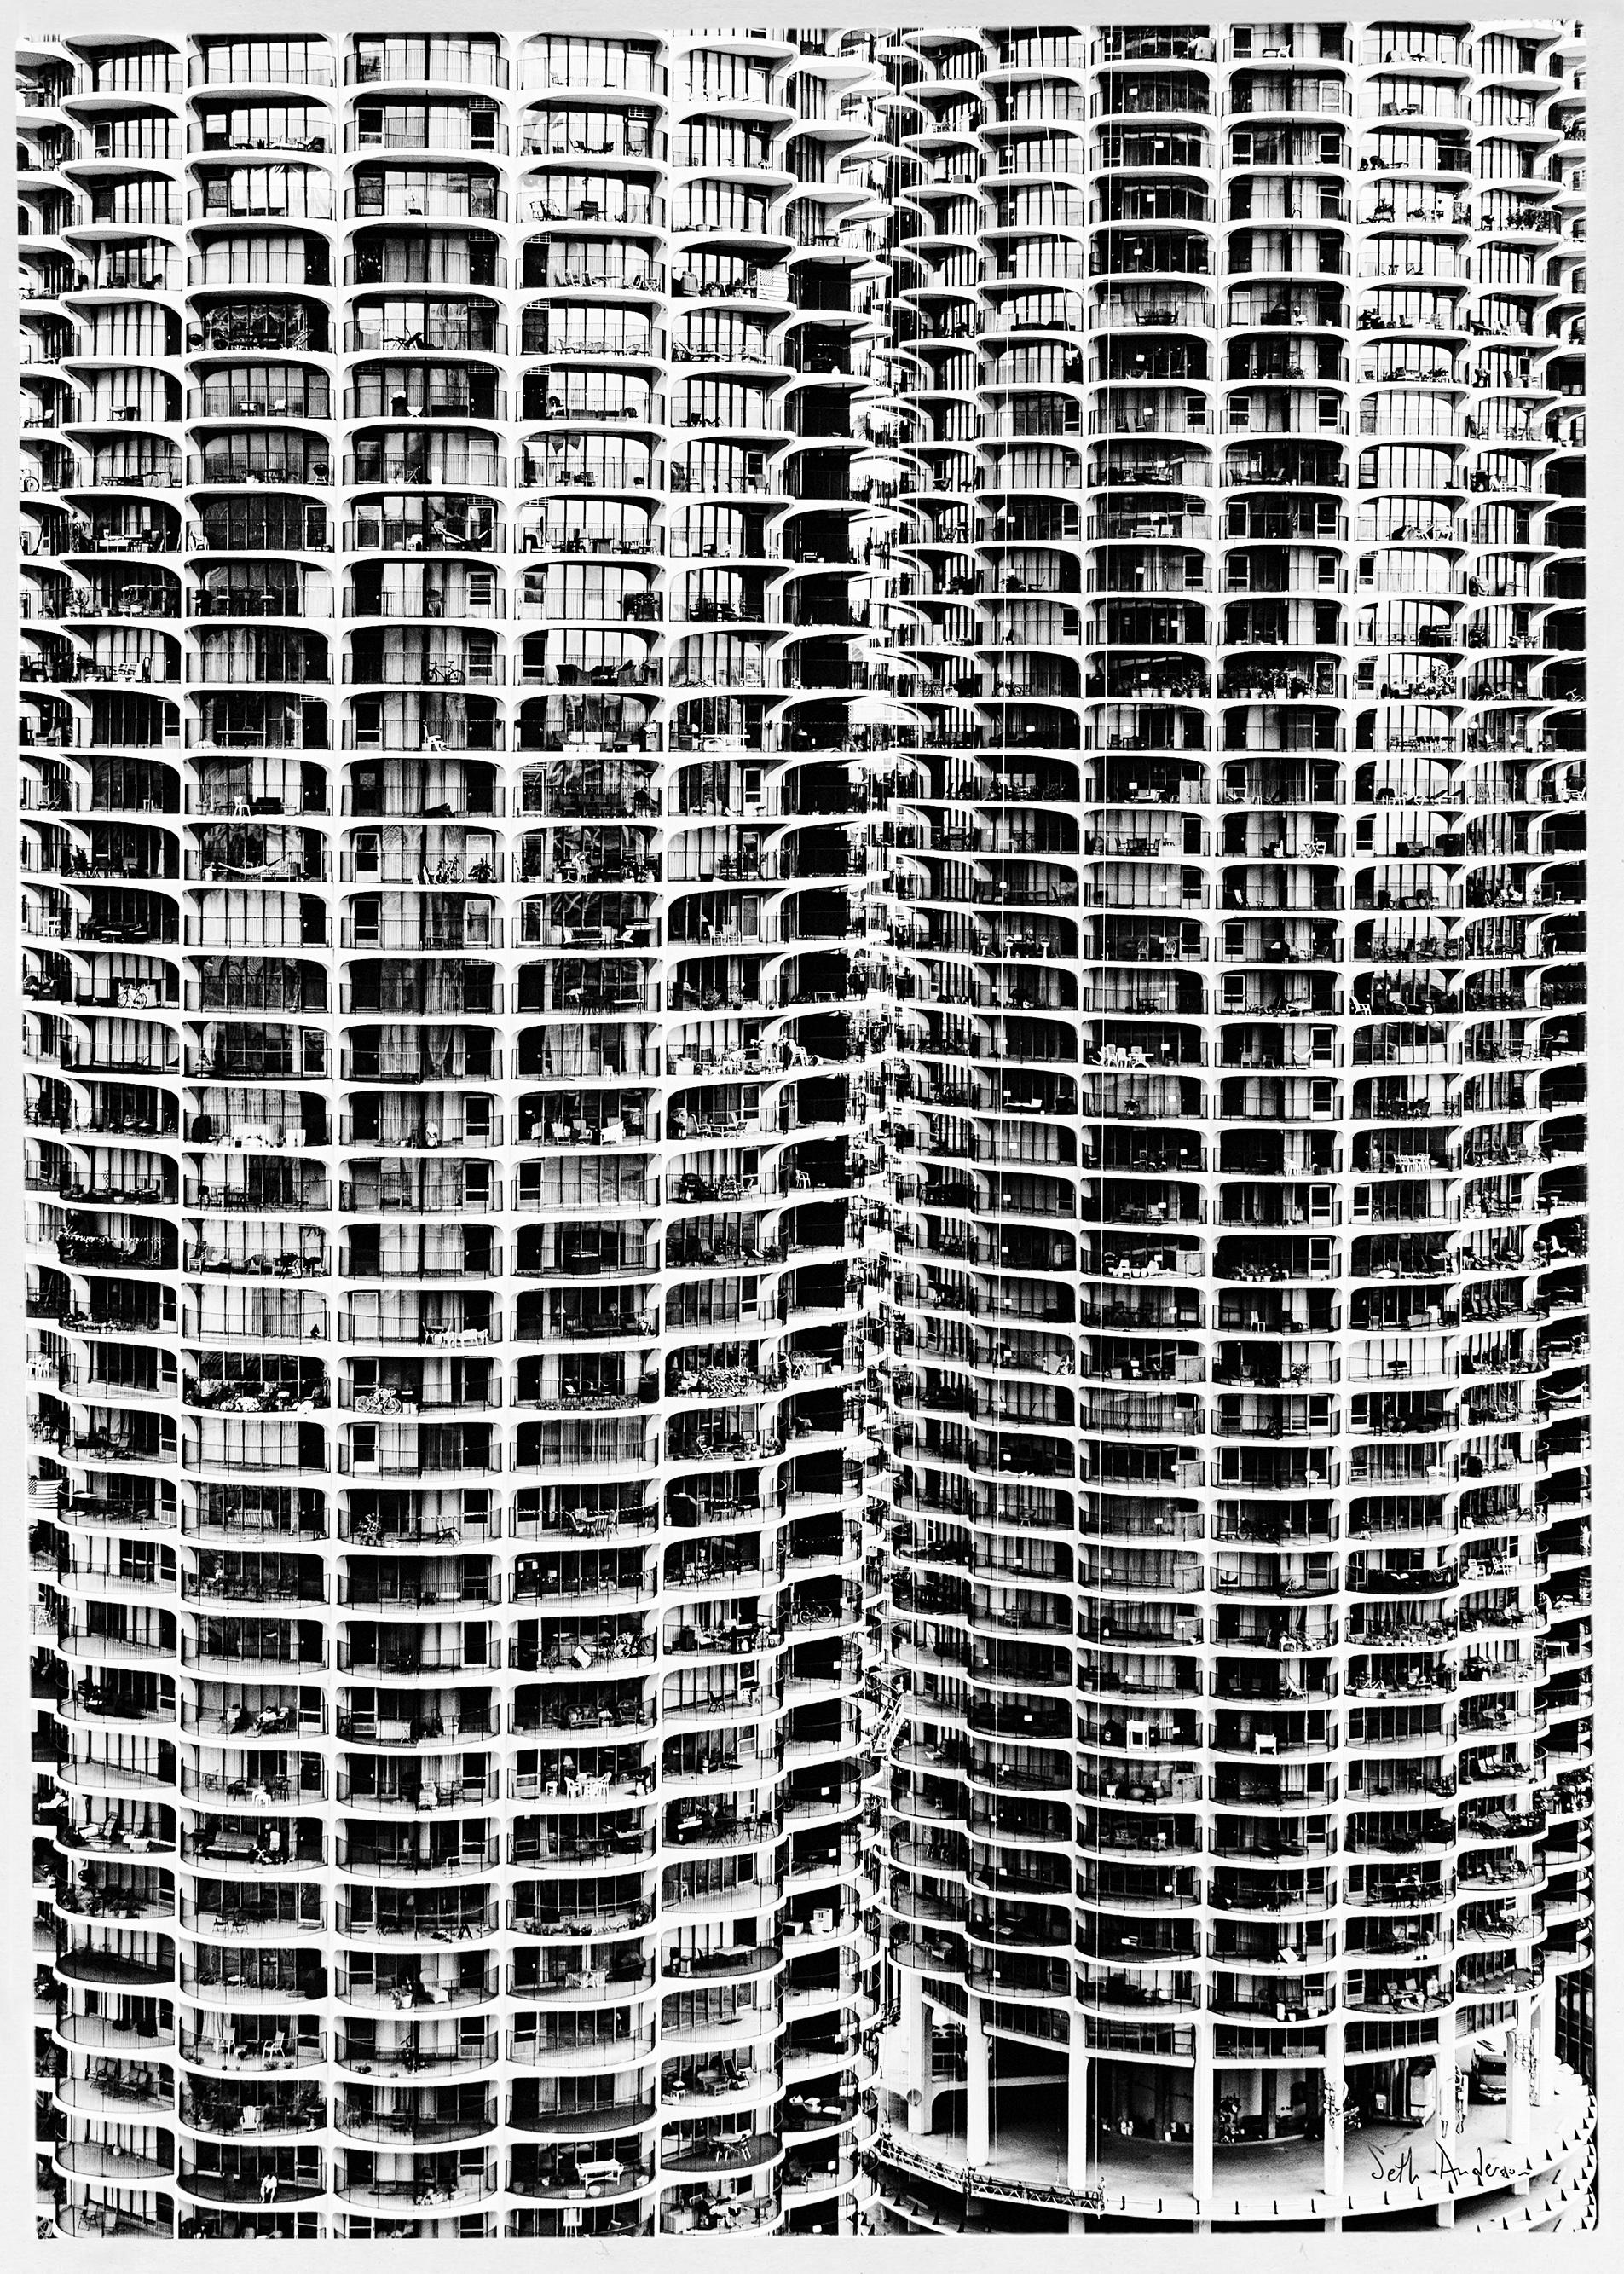 Overlooked In Haste - Bertrand Goldberg's Marina City